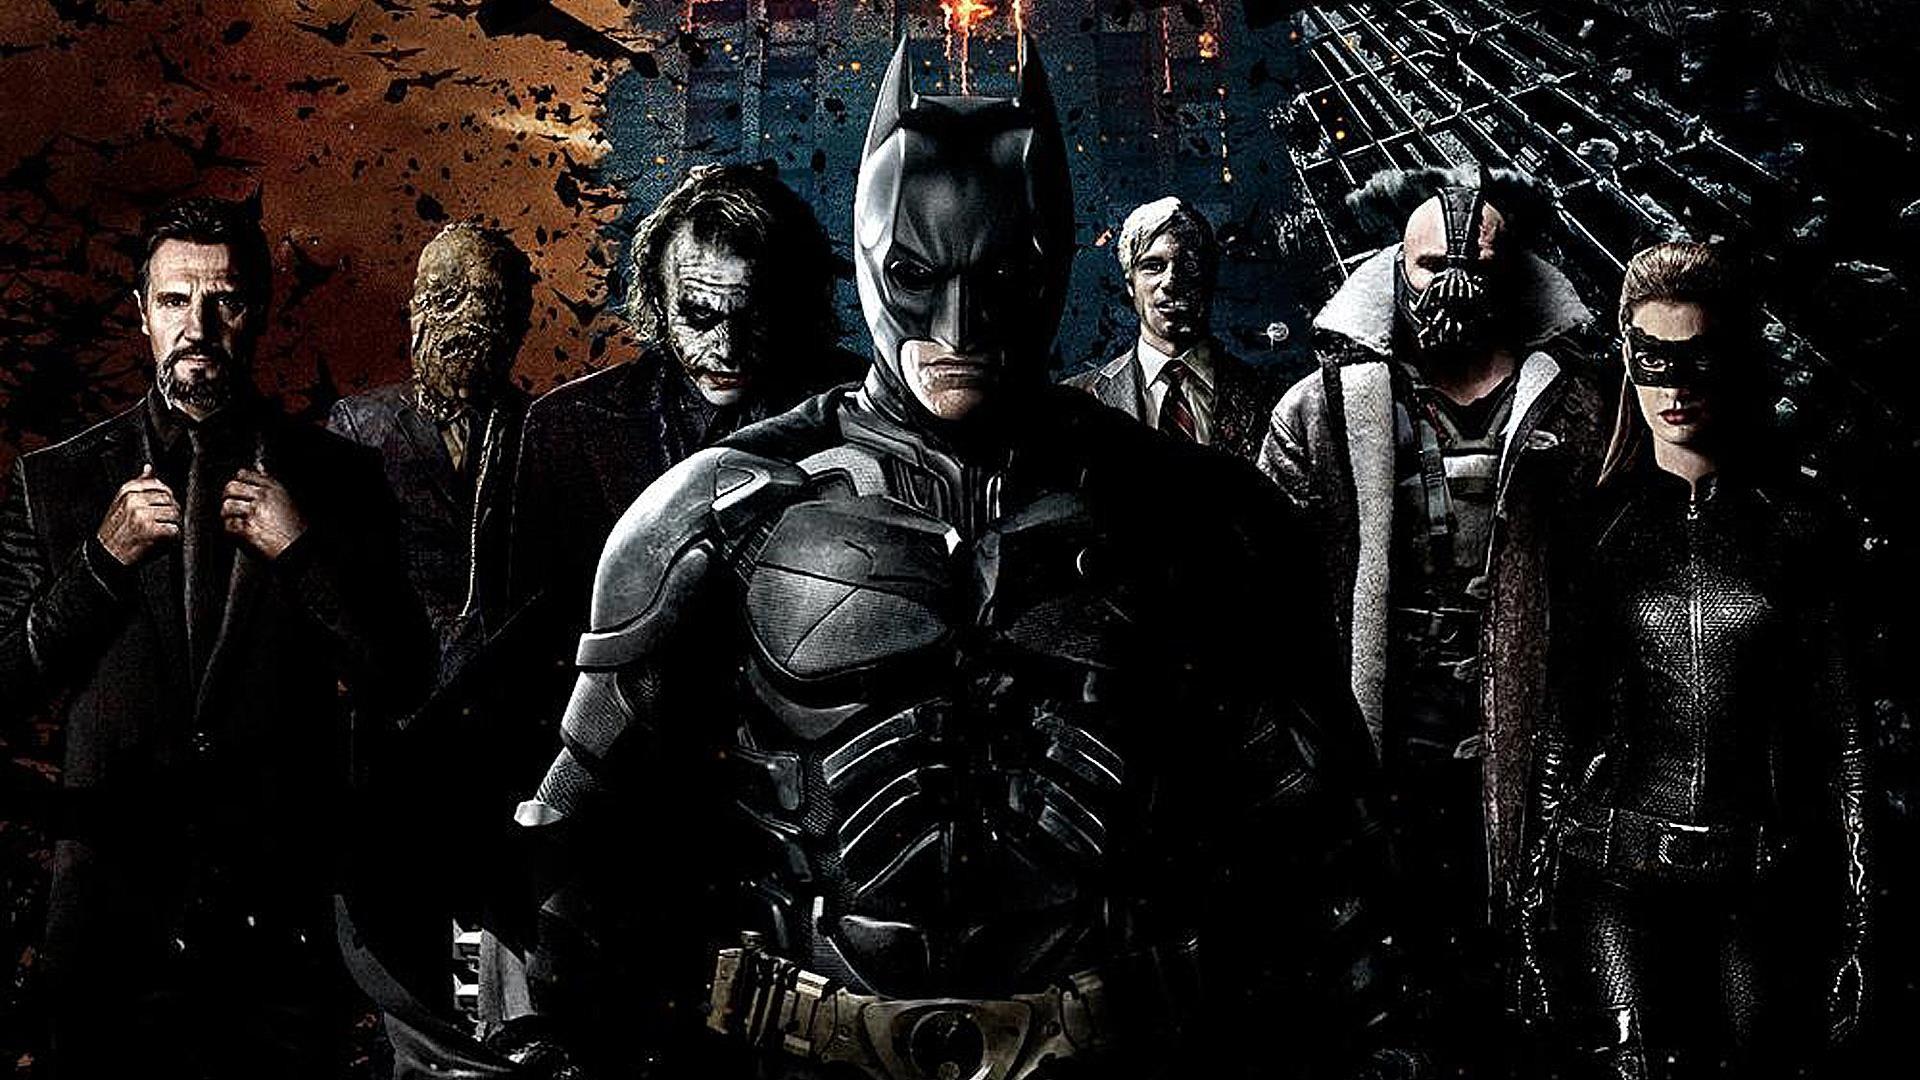 The Dark Knight Returns Wallpapers – Wallpaper Cave. 30 Batman HD Wallpapers  for Desktop